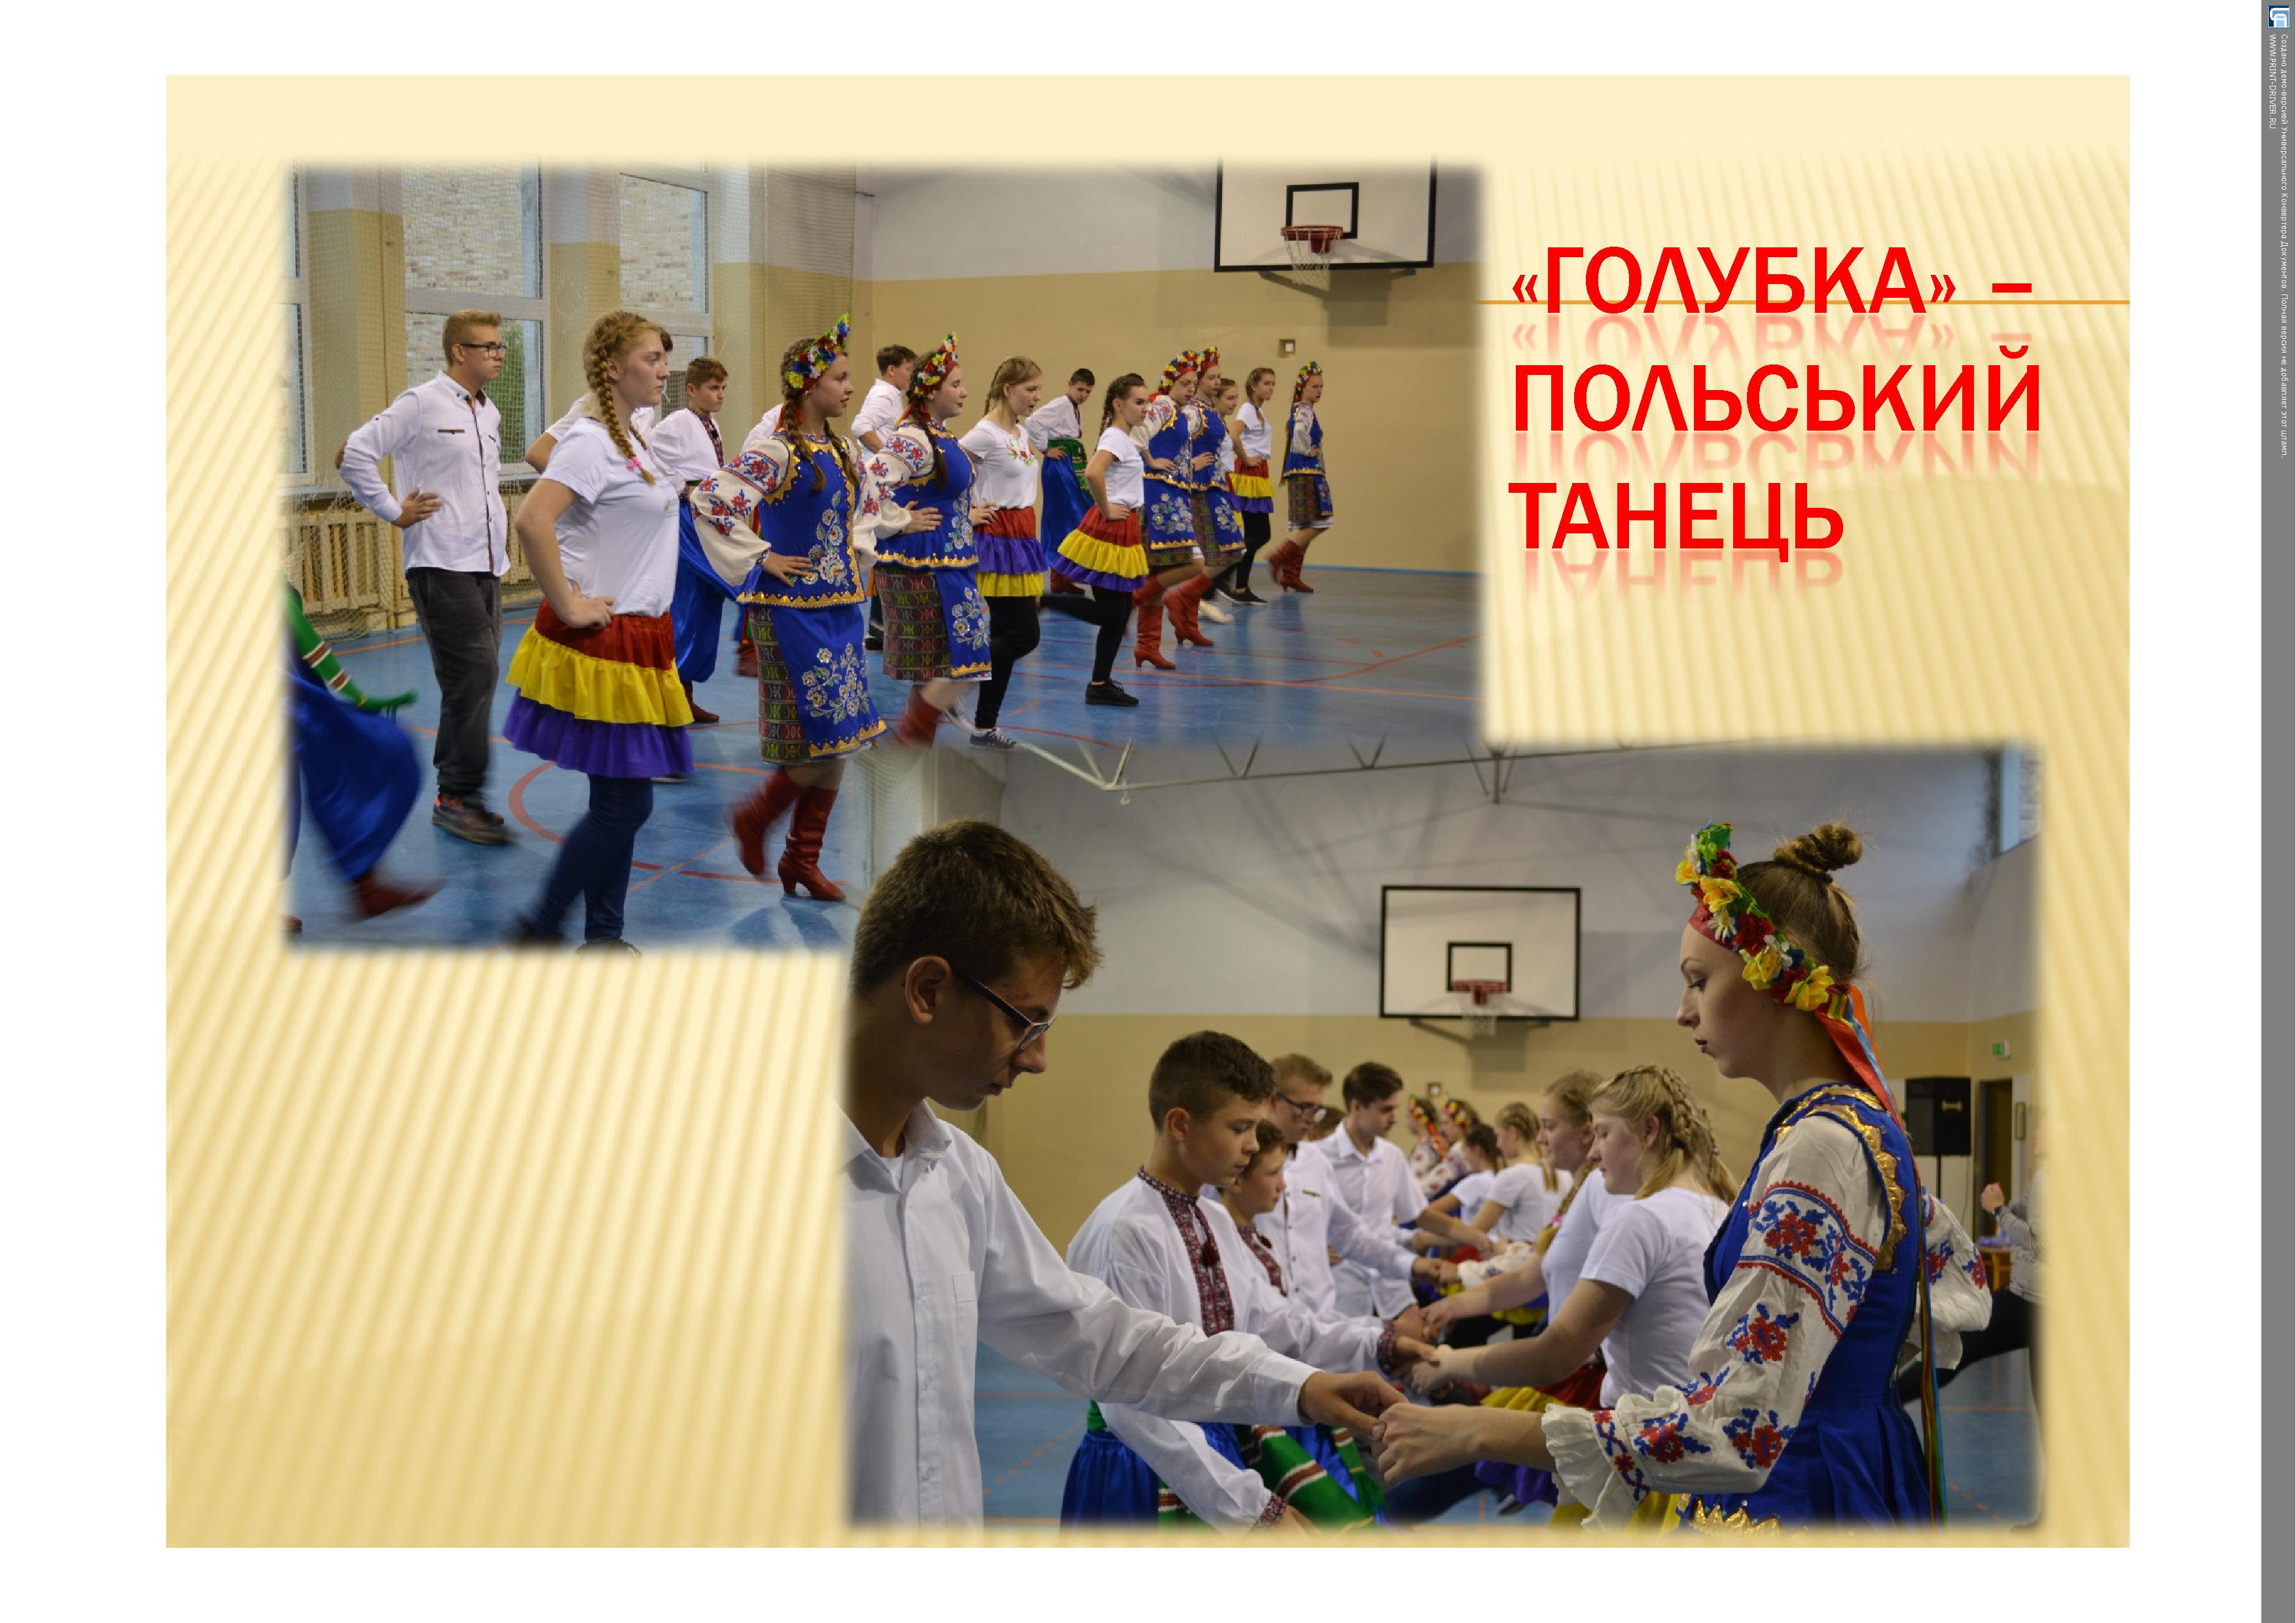 prezentacija-polshcha36